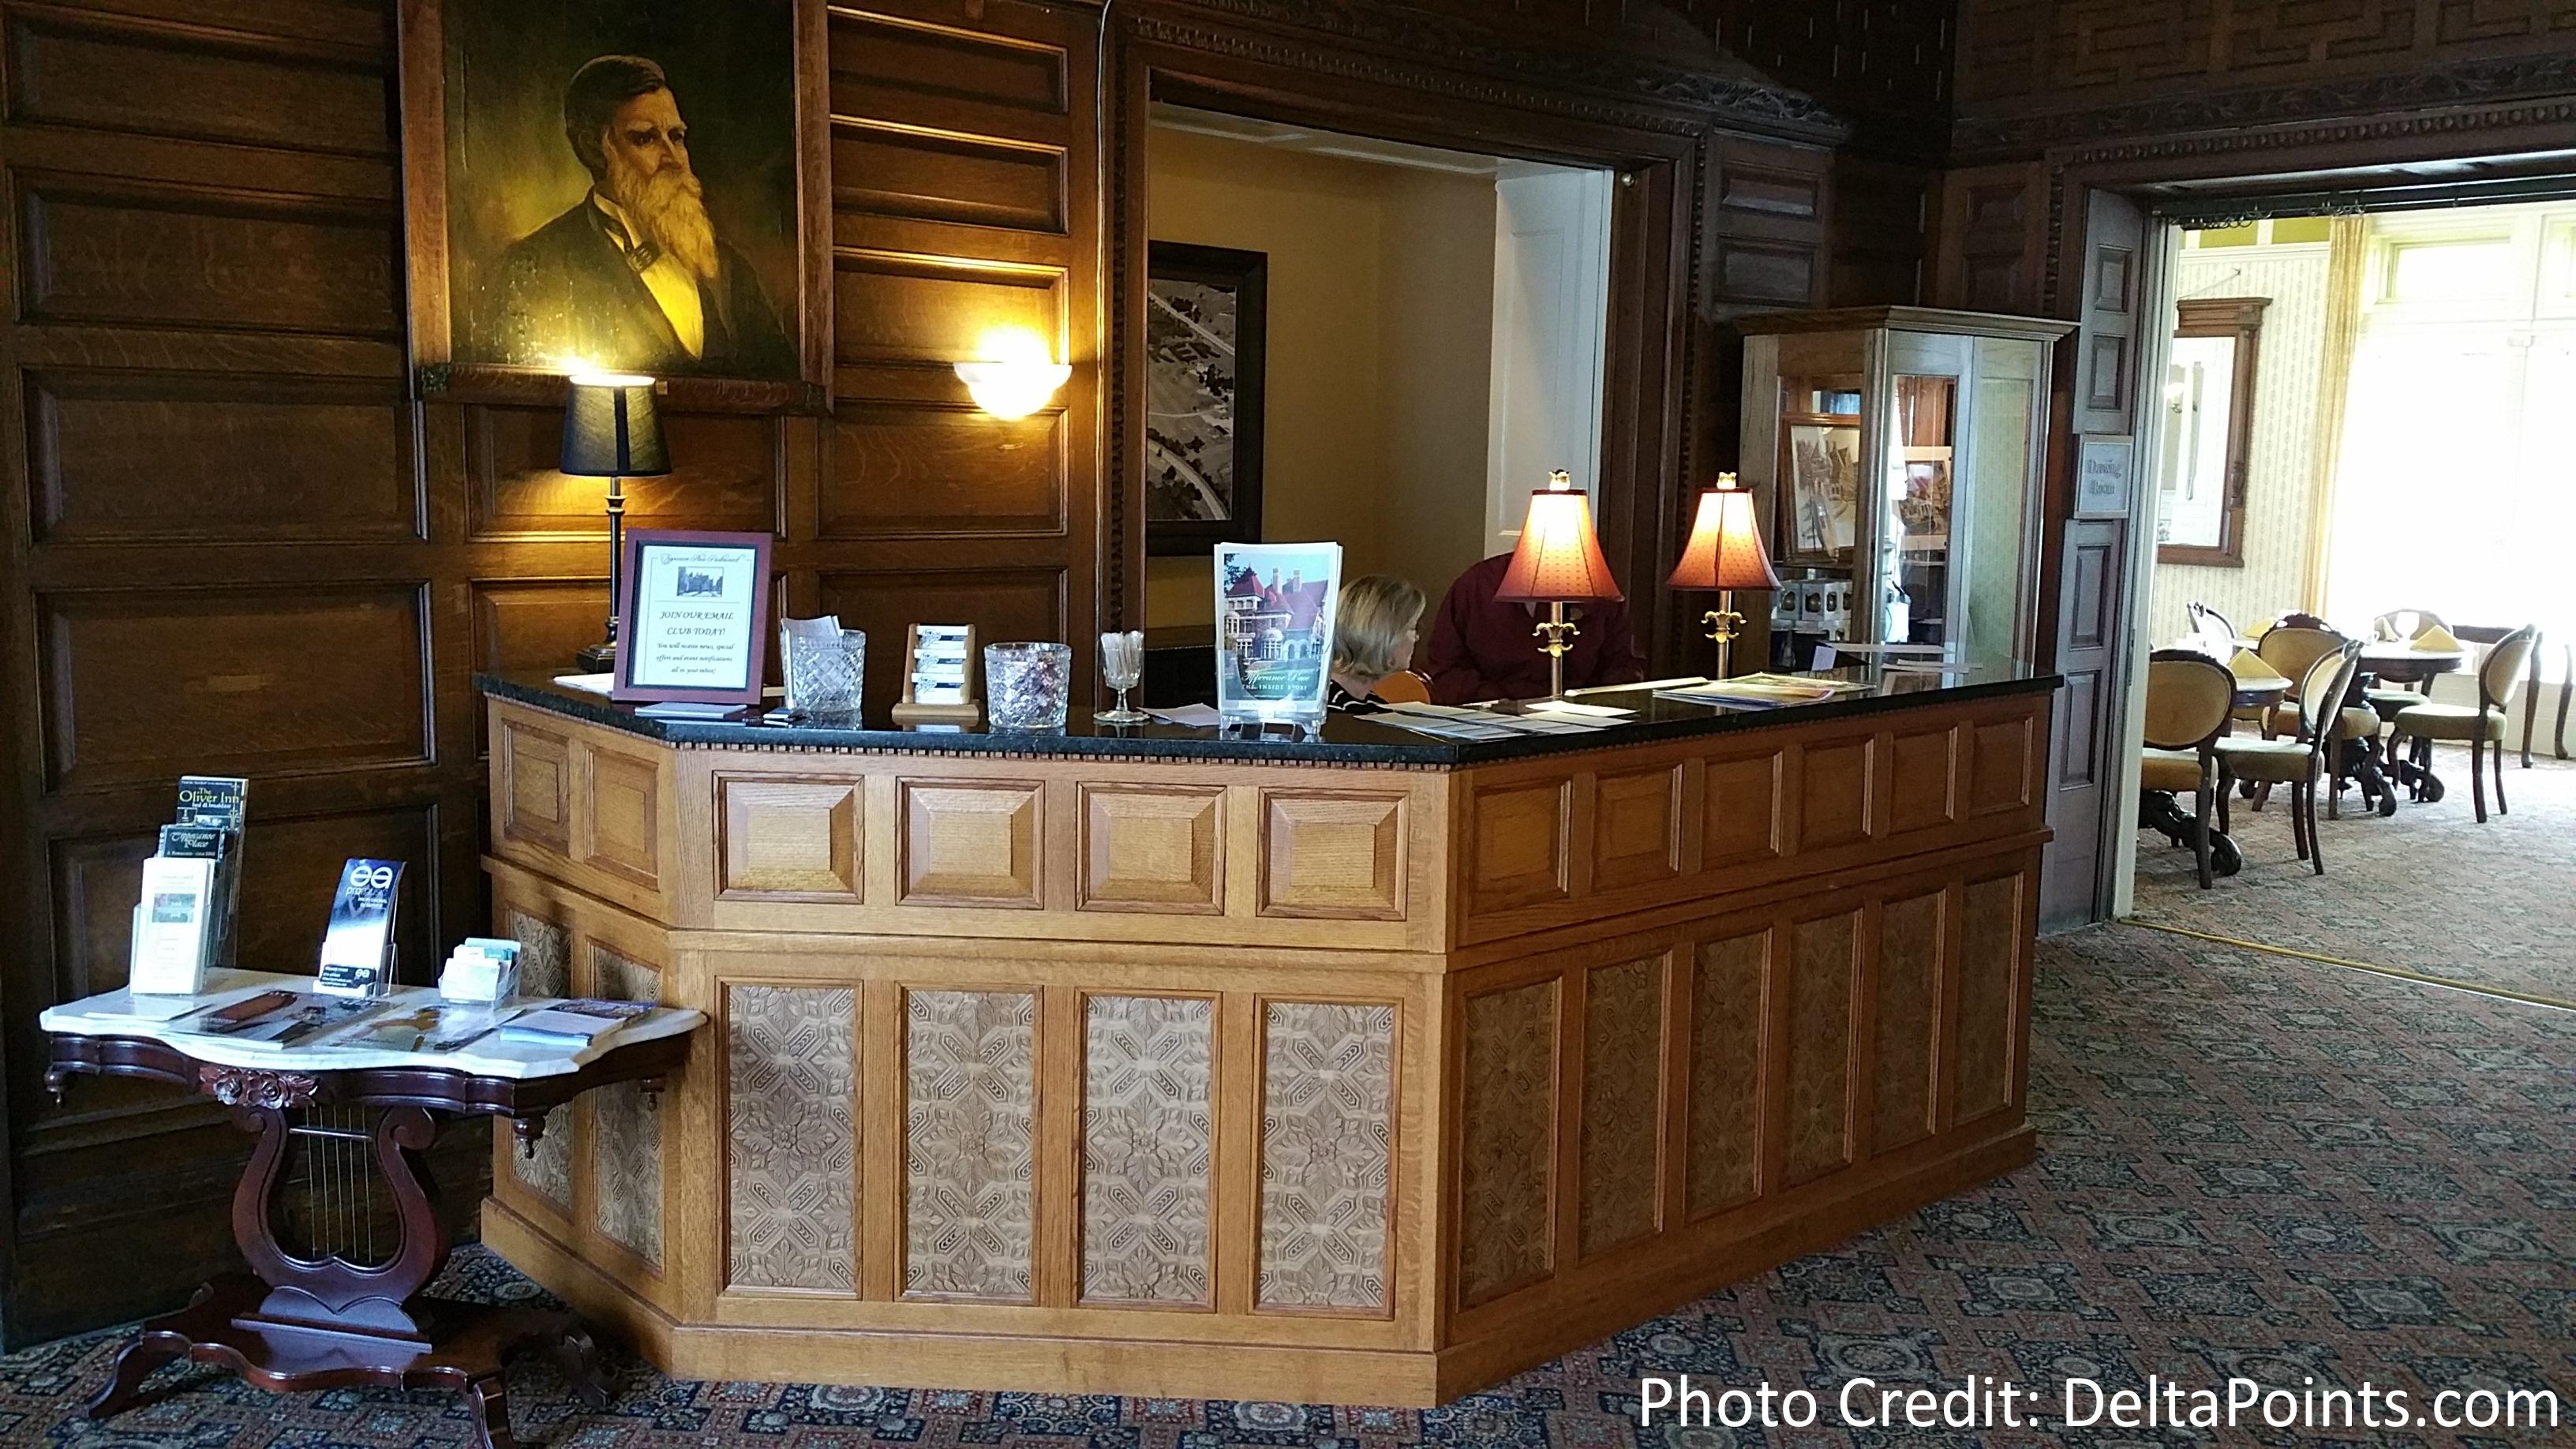 Reception area with a portrait of Benjamin Harrison.